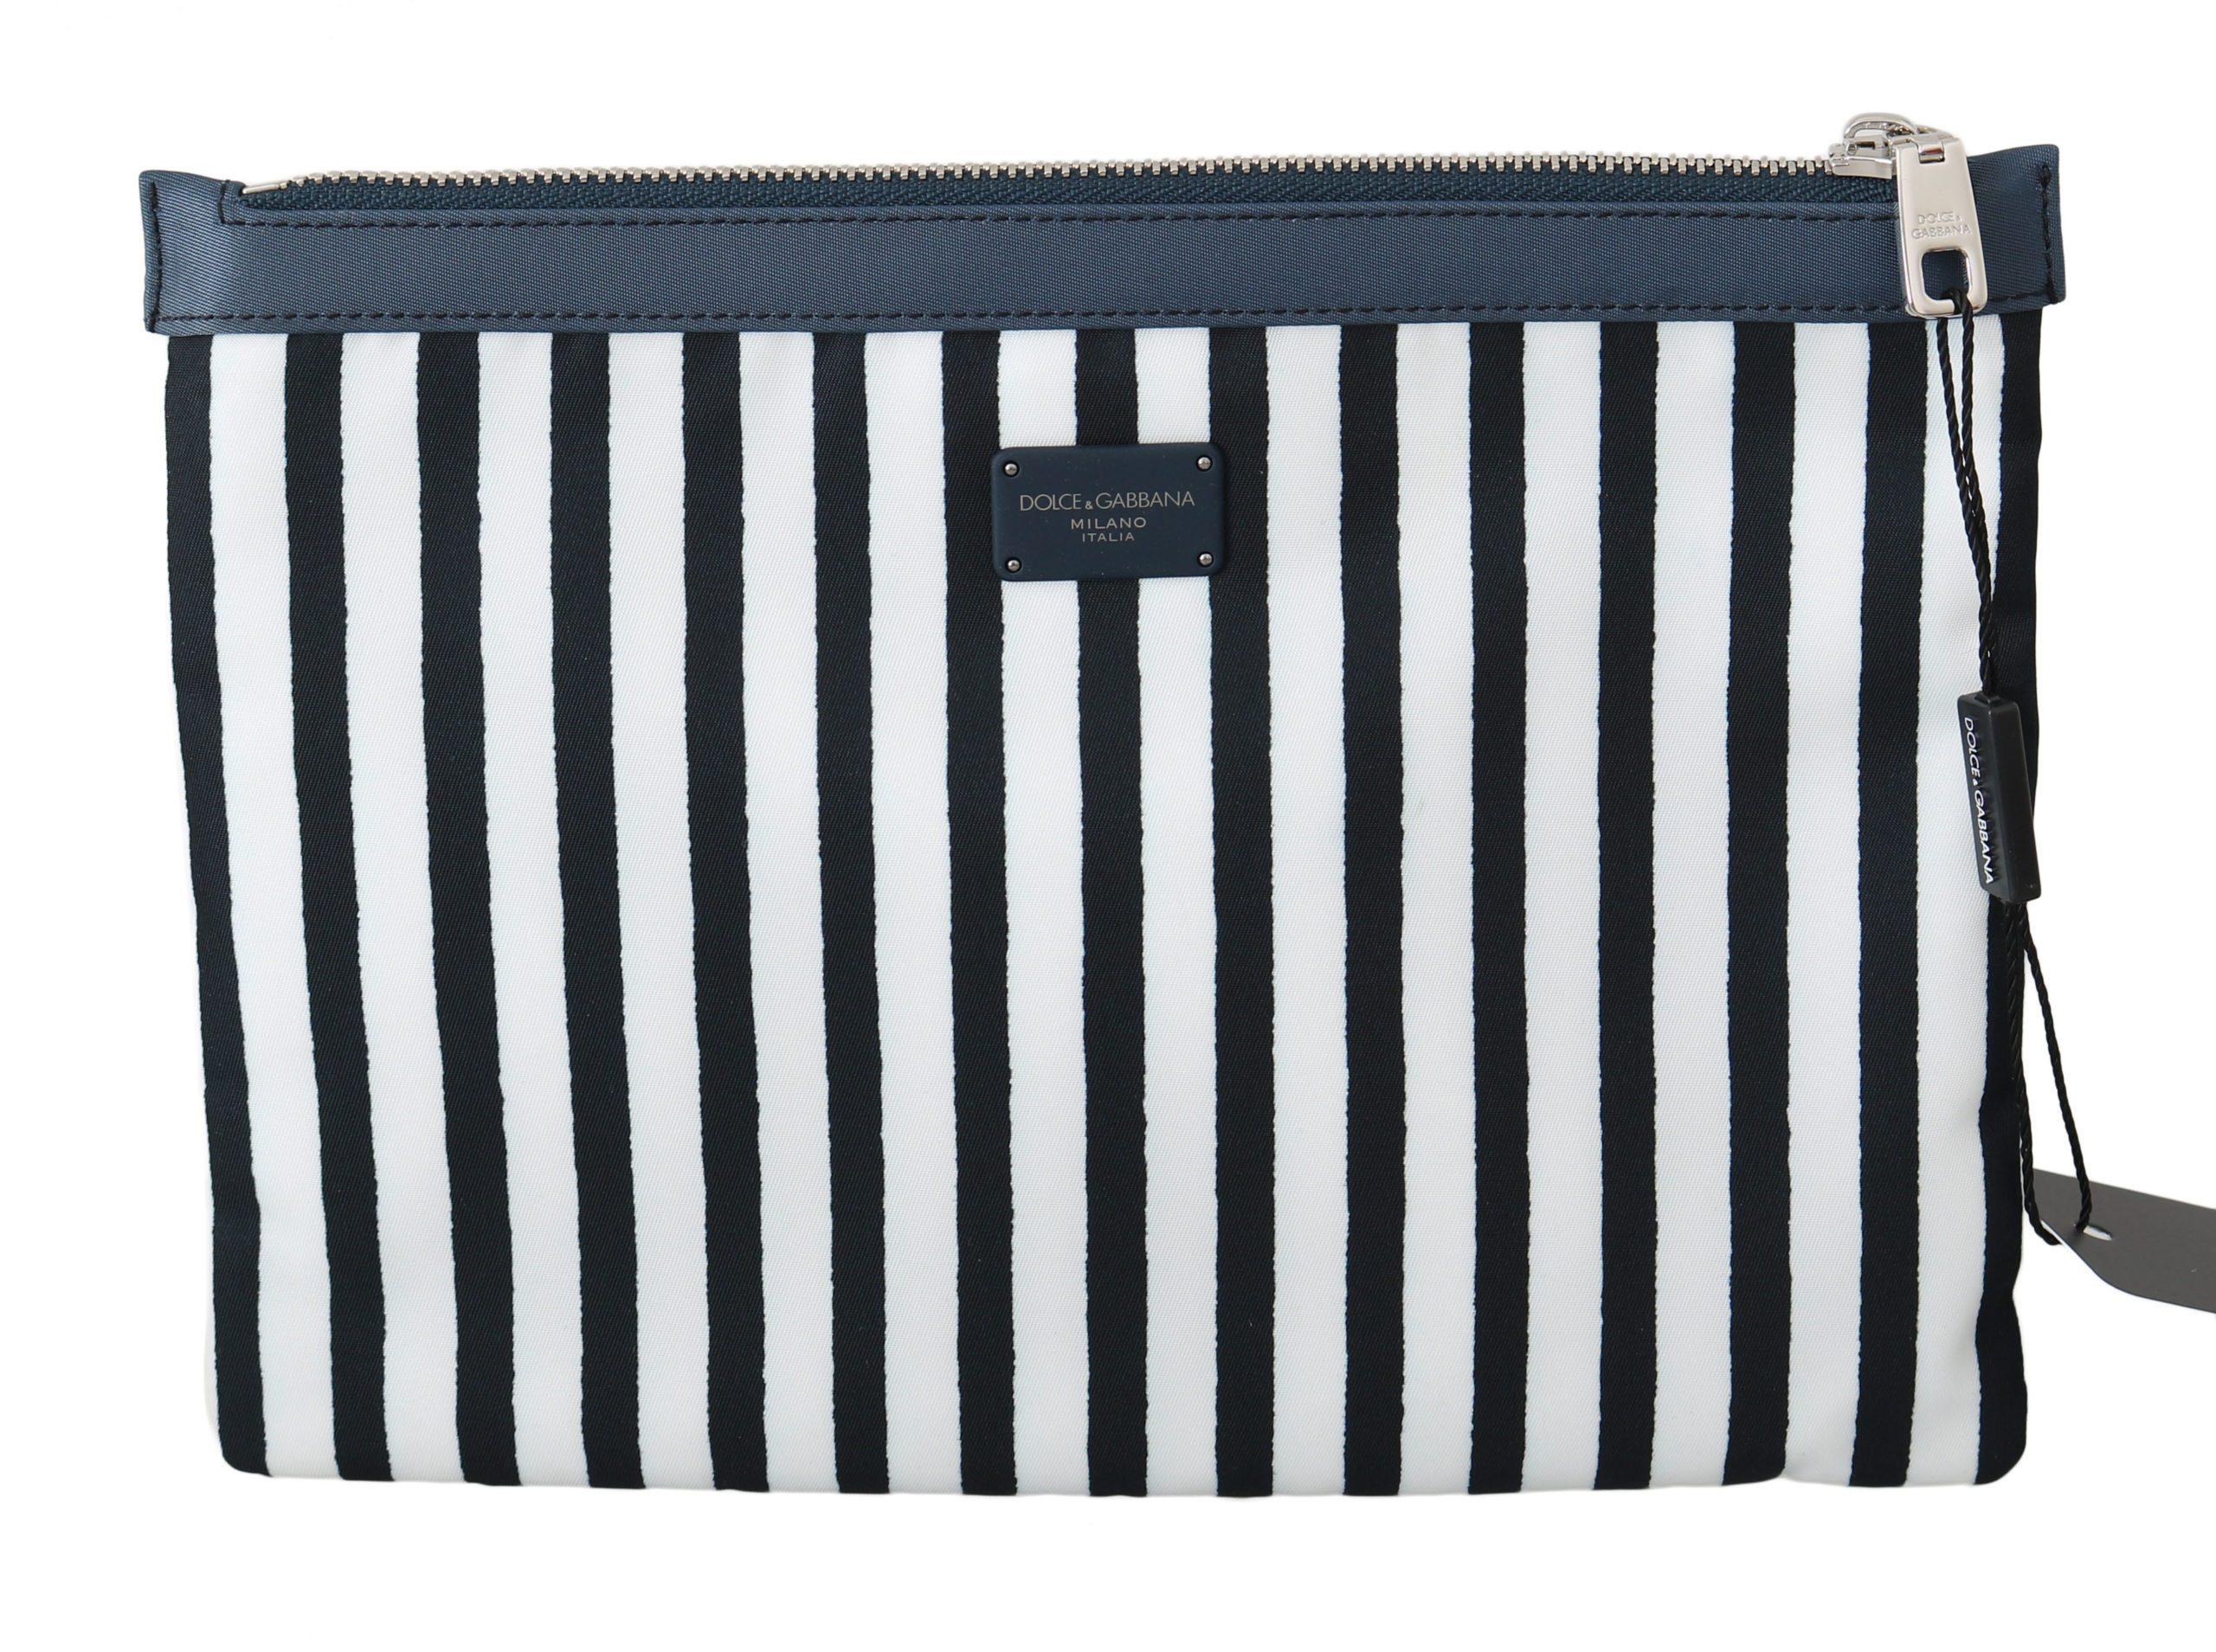 Dolce & Gabbana Men's Striped Zipper Messenger Bag Blue and White VA8651